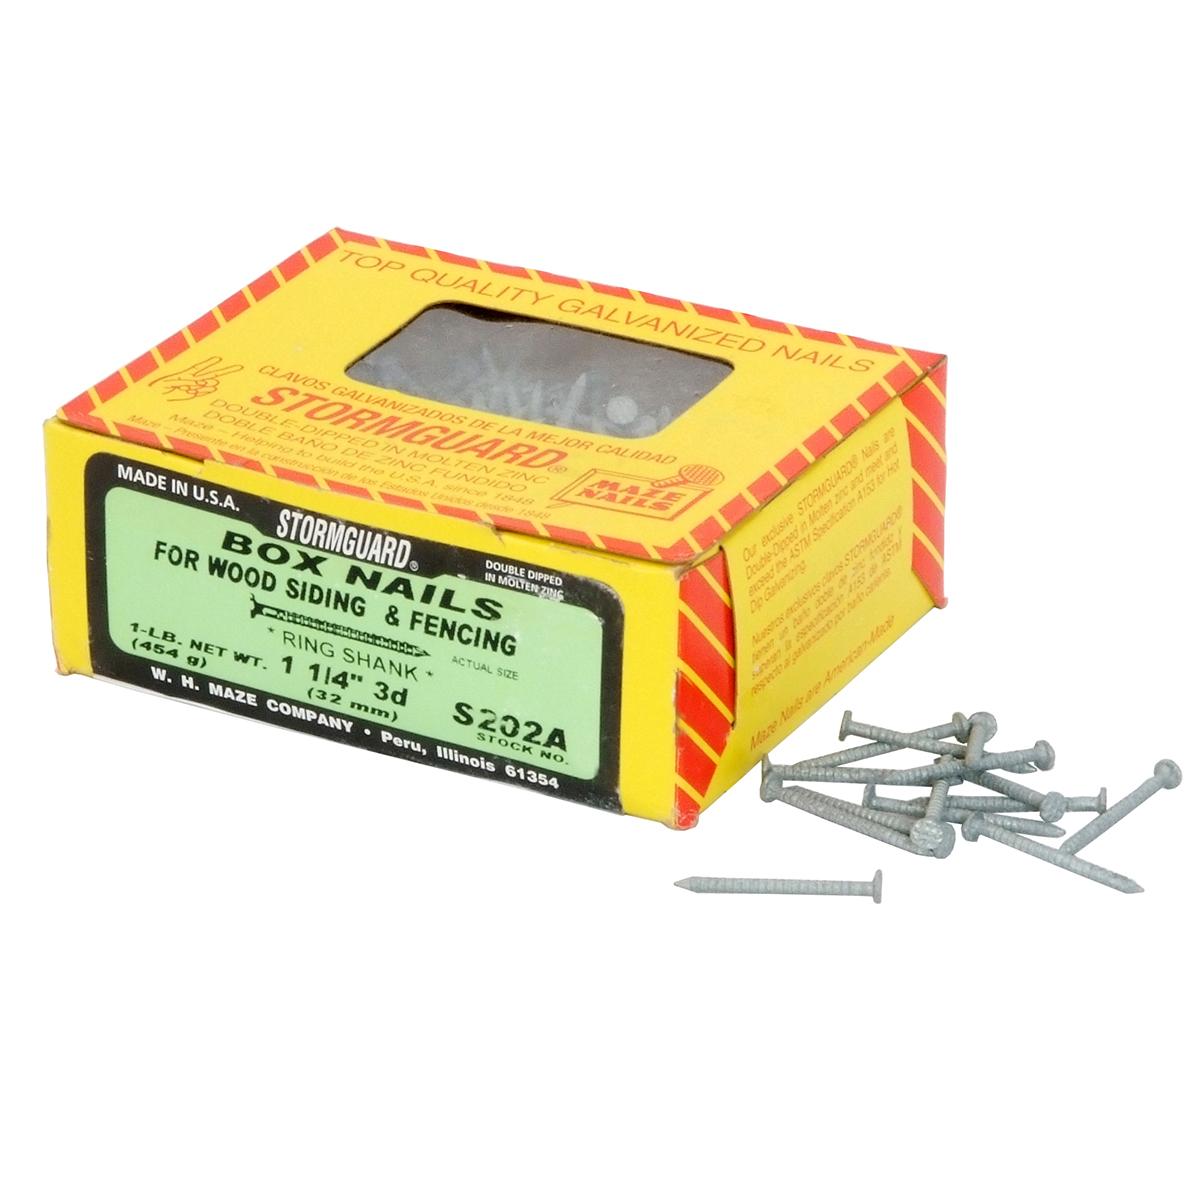 Maze 1 1 4 Quot Box Nails For Wood Siding Amp Fencing 1lb Box